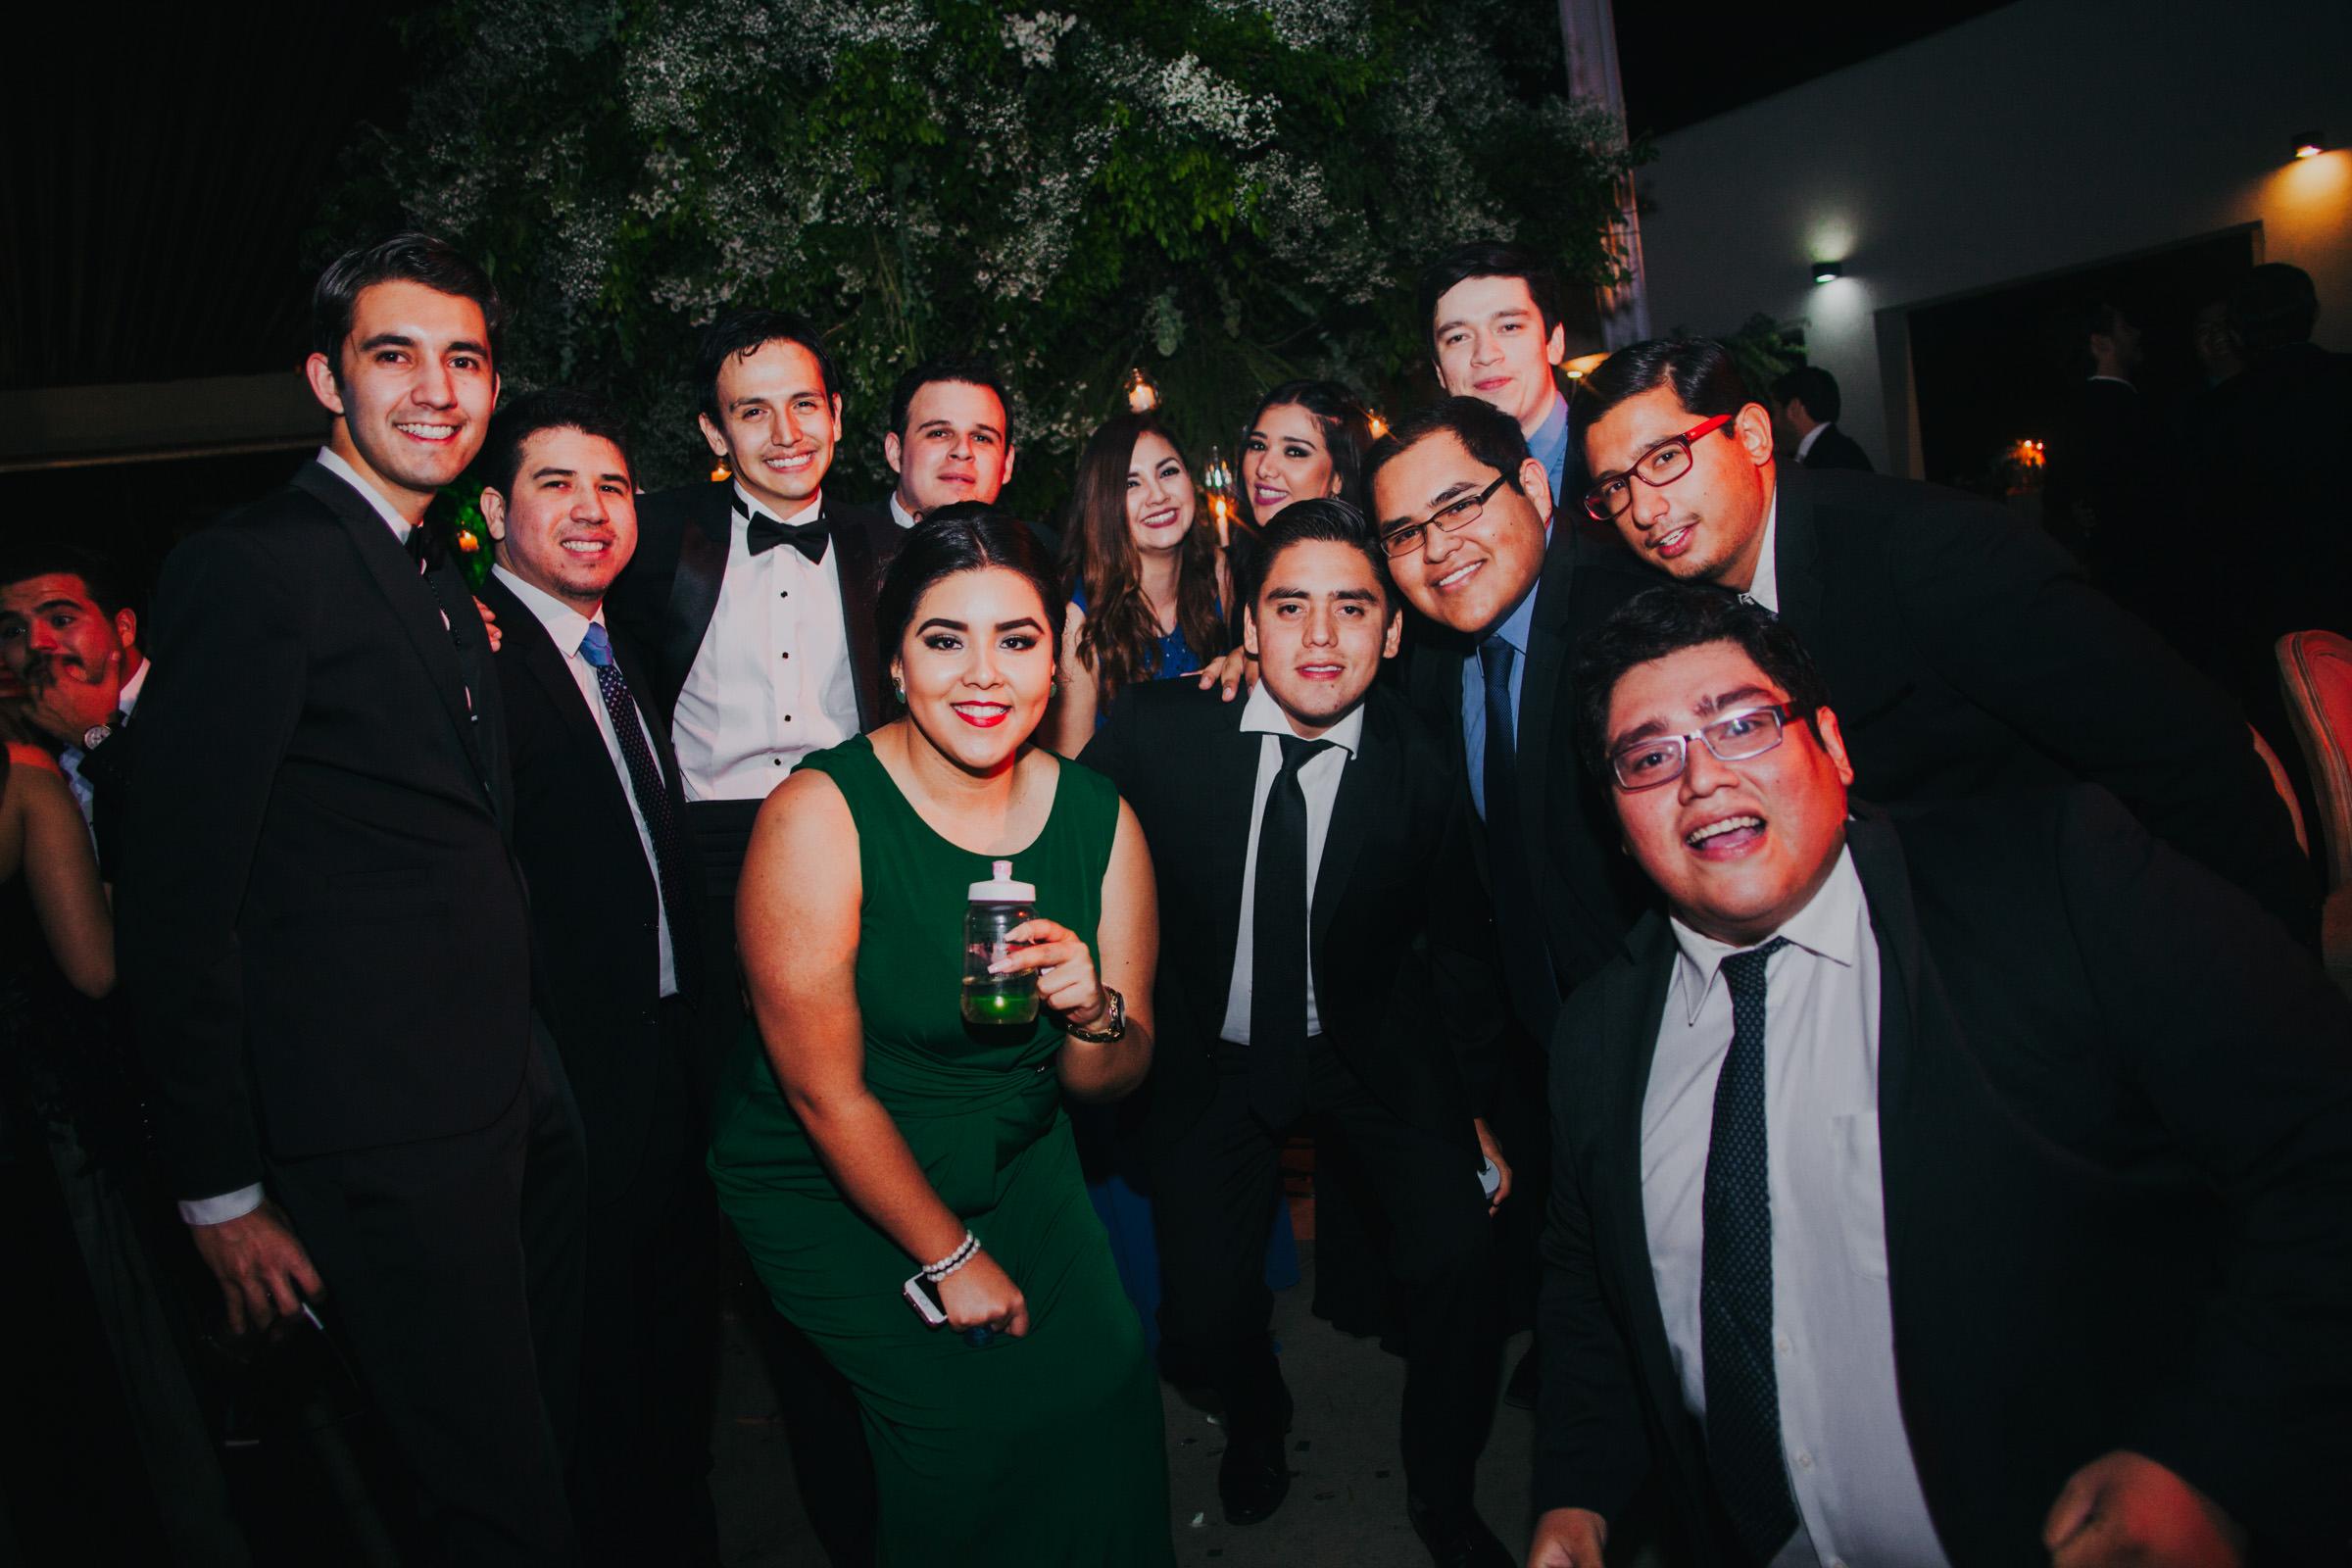 irapuato-boda-fotografia-jardines-alcalde-guanajuato-paulina-juan-pedro--165.jpg